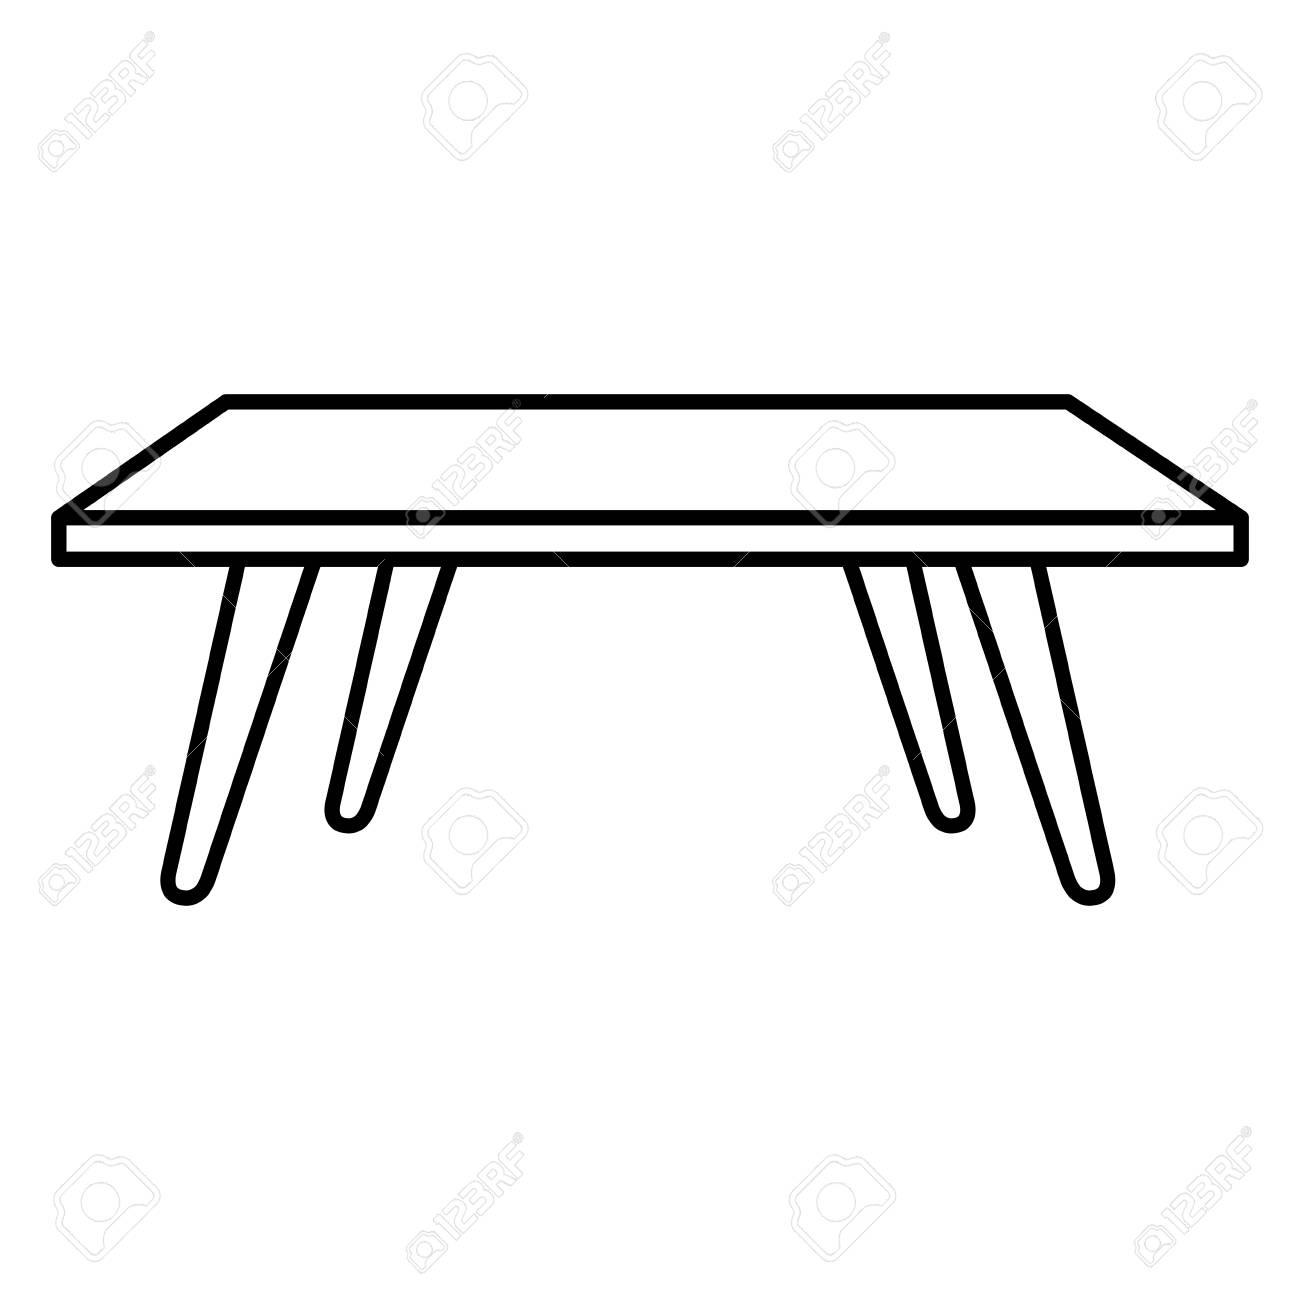 Living Room Center Table Vector Illustration Design Royalty Free ...